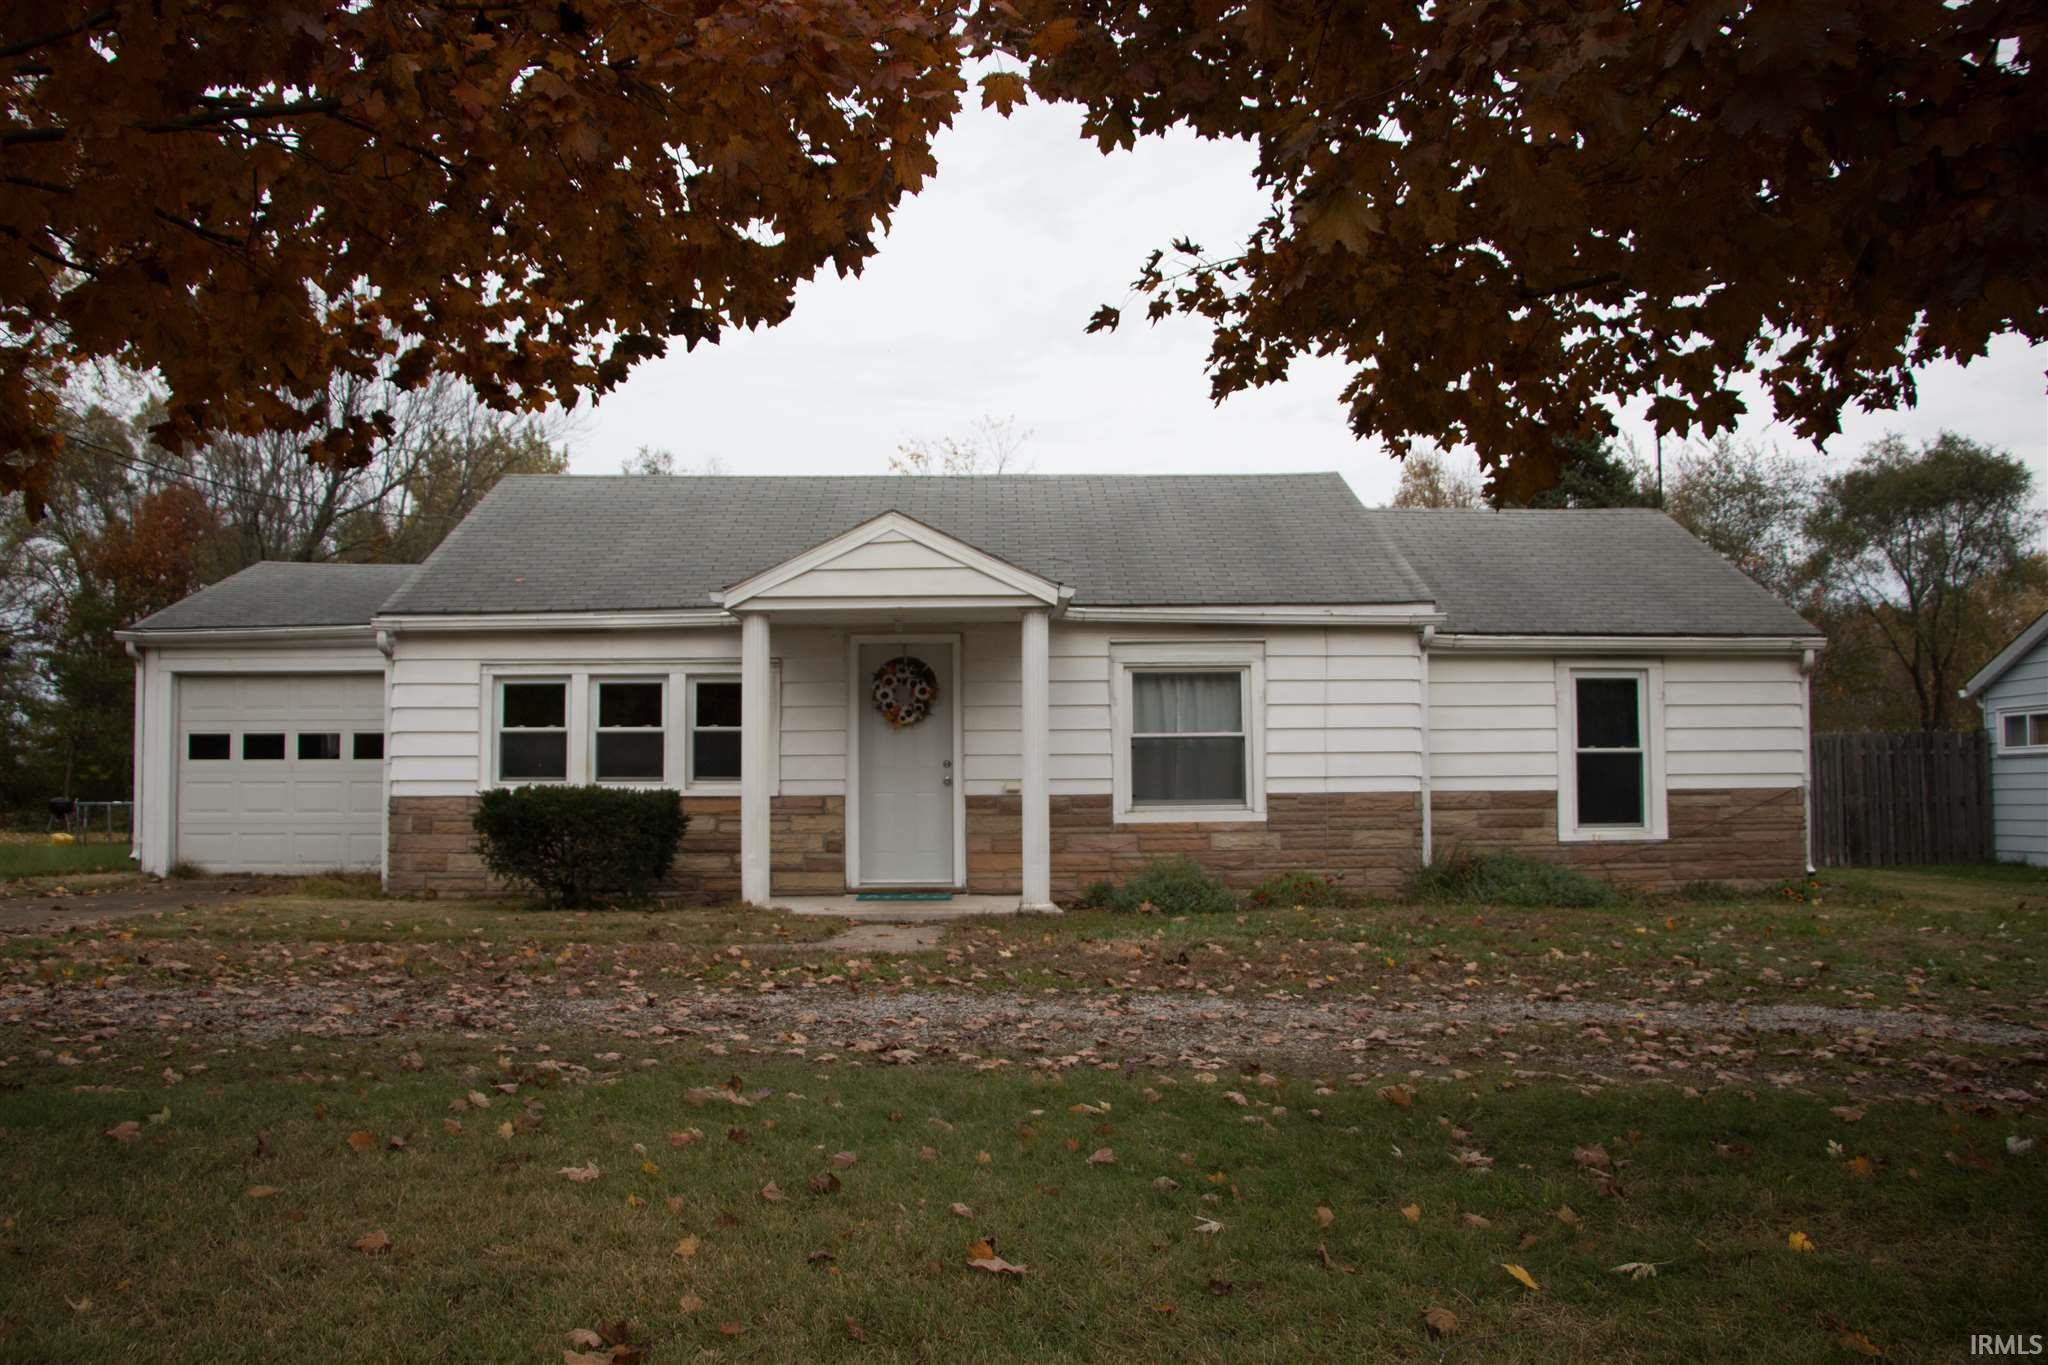 25949 County Road 6 Elkhart, IN 46514